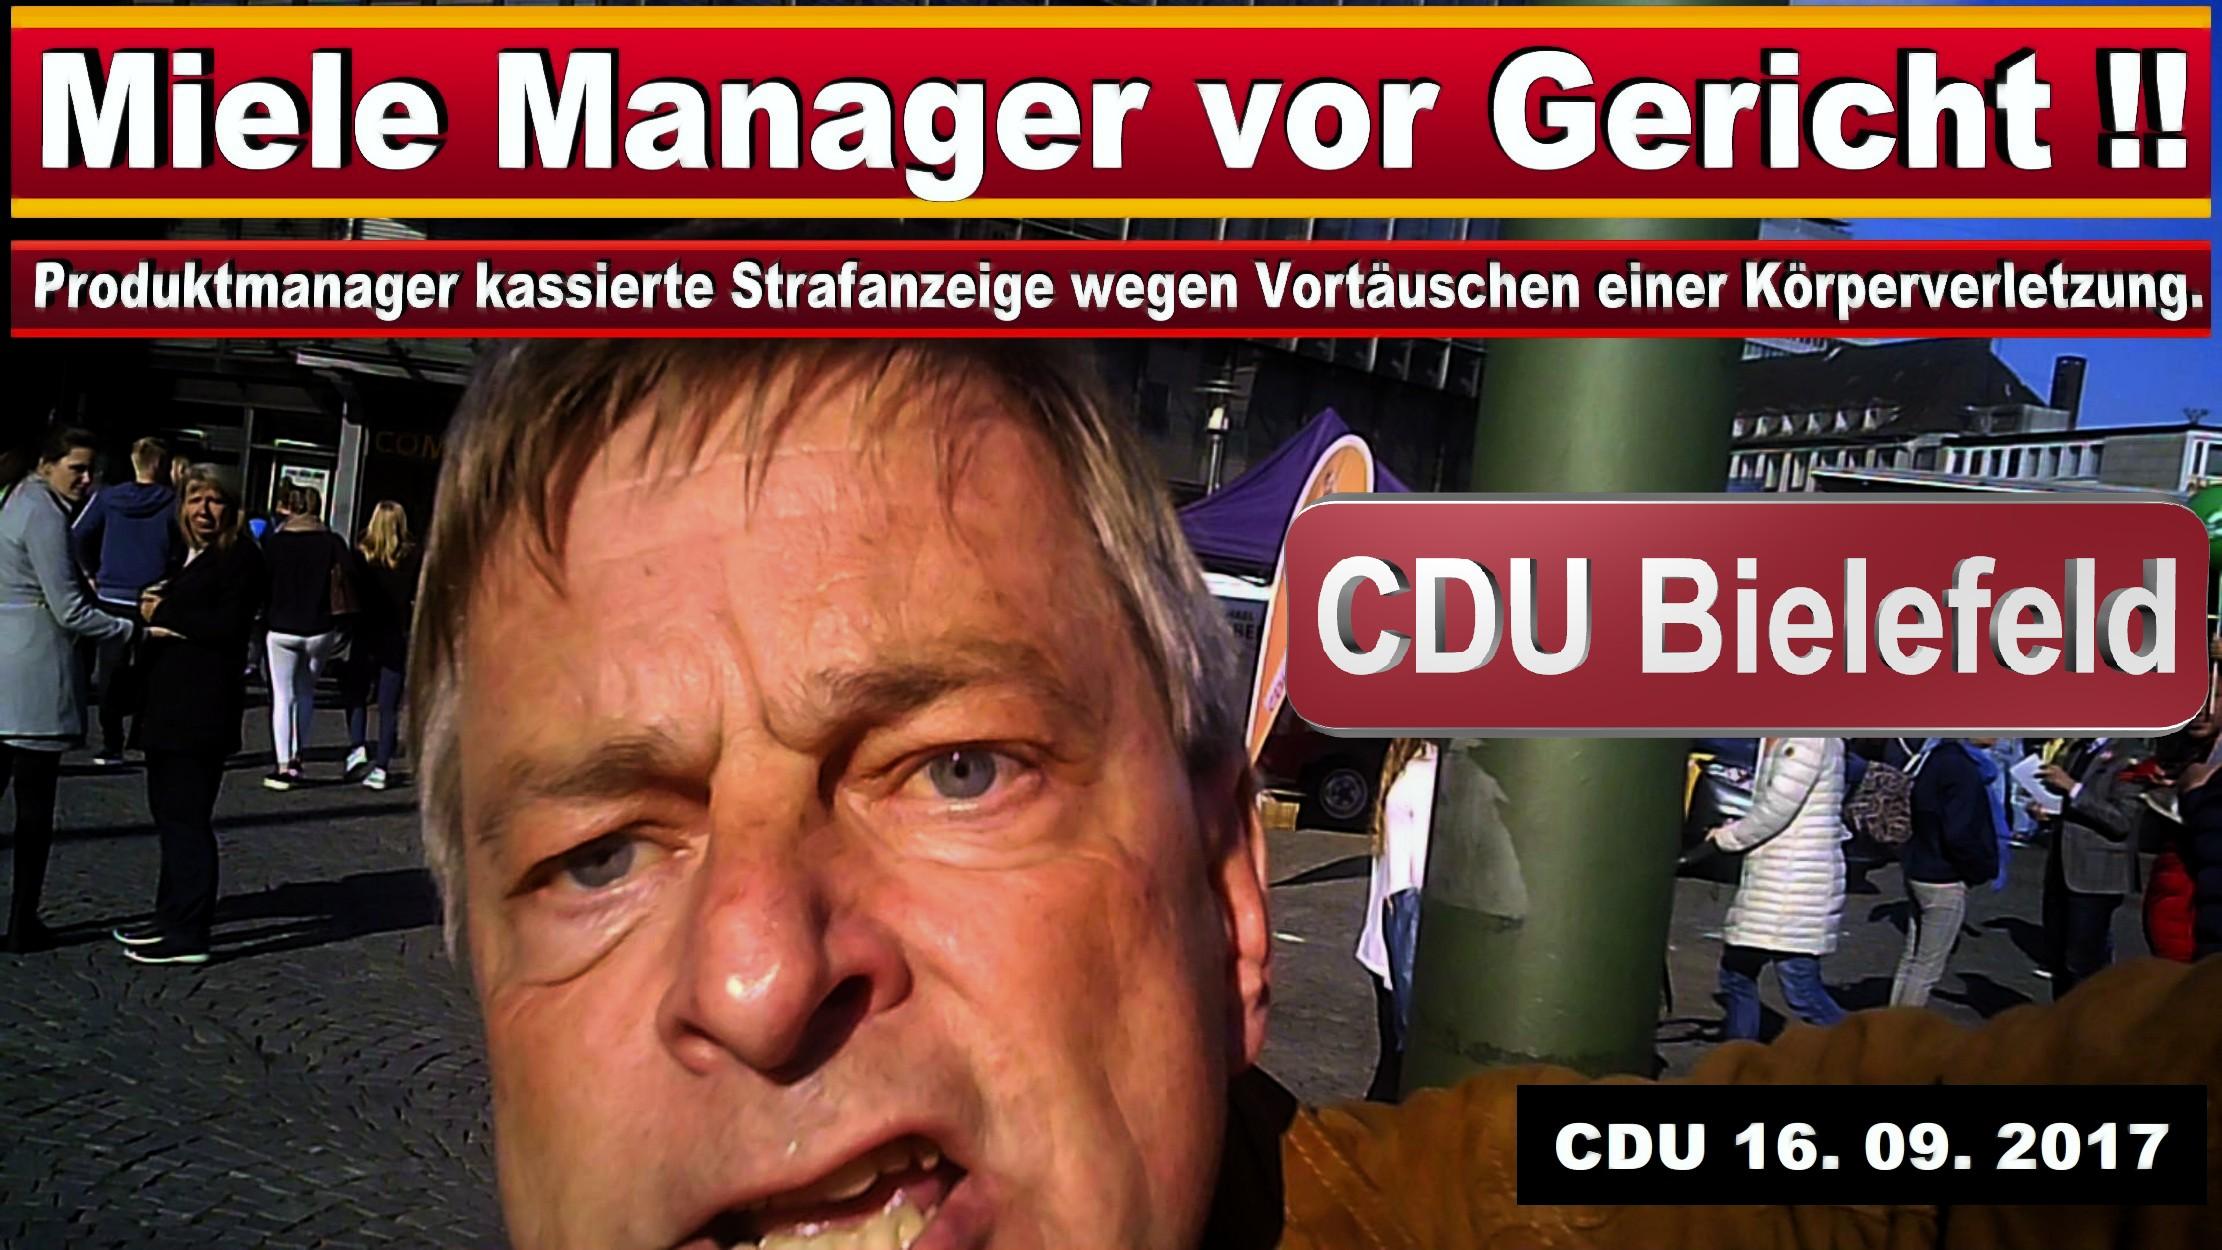 CDU BIELEFELD FRAKTION MICHAEL WEBER MIELE GüTERSLOH PRODUKTMANAGER JURIST SPD FDP AFD BIELEFELD